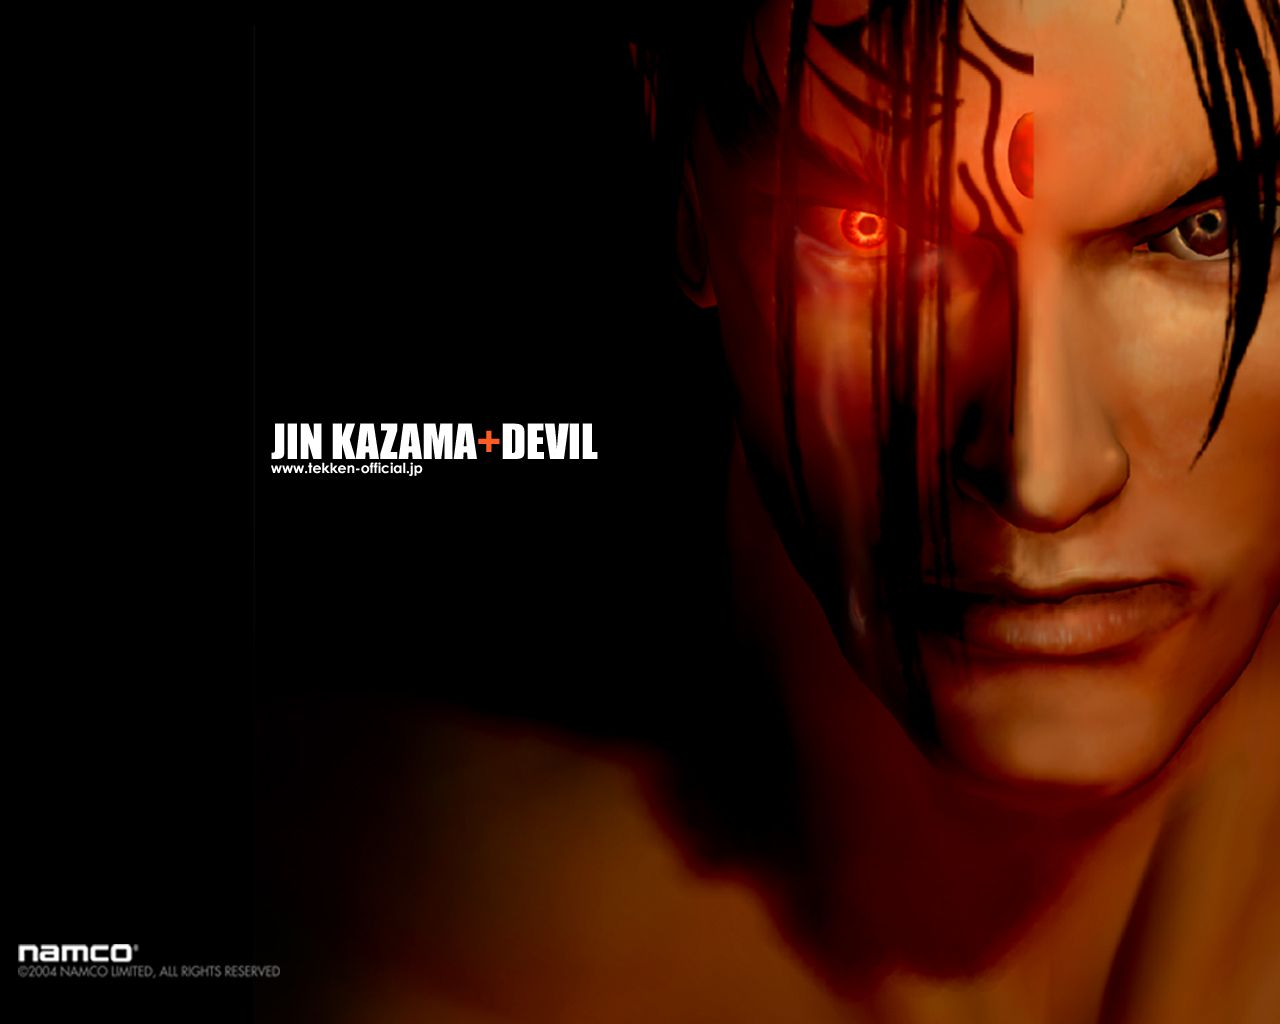 Tekken Tag Tournament Lars Wallpaper By ElvinJomar On DeviantArt 1280x800 2 Wallpapers 51